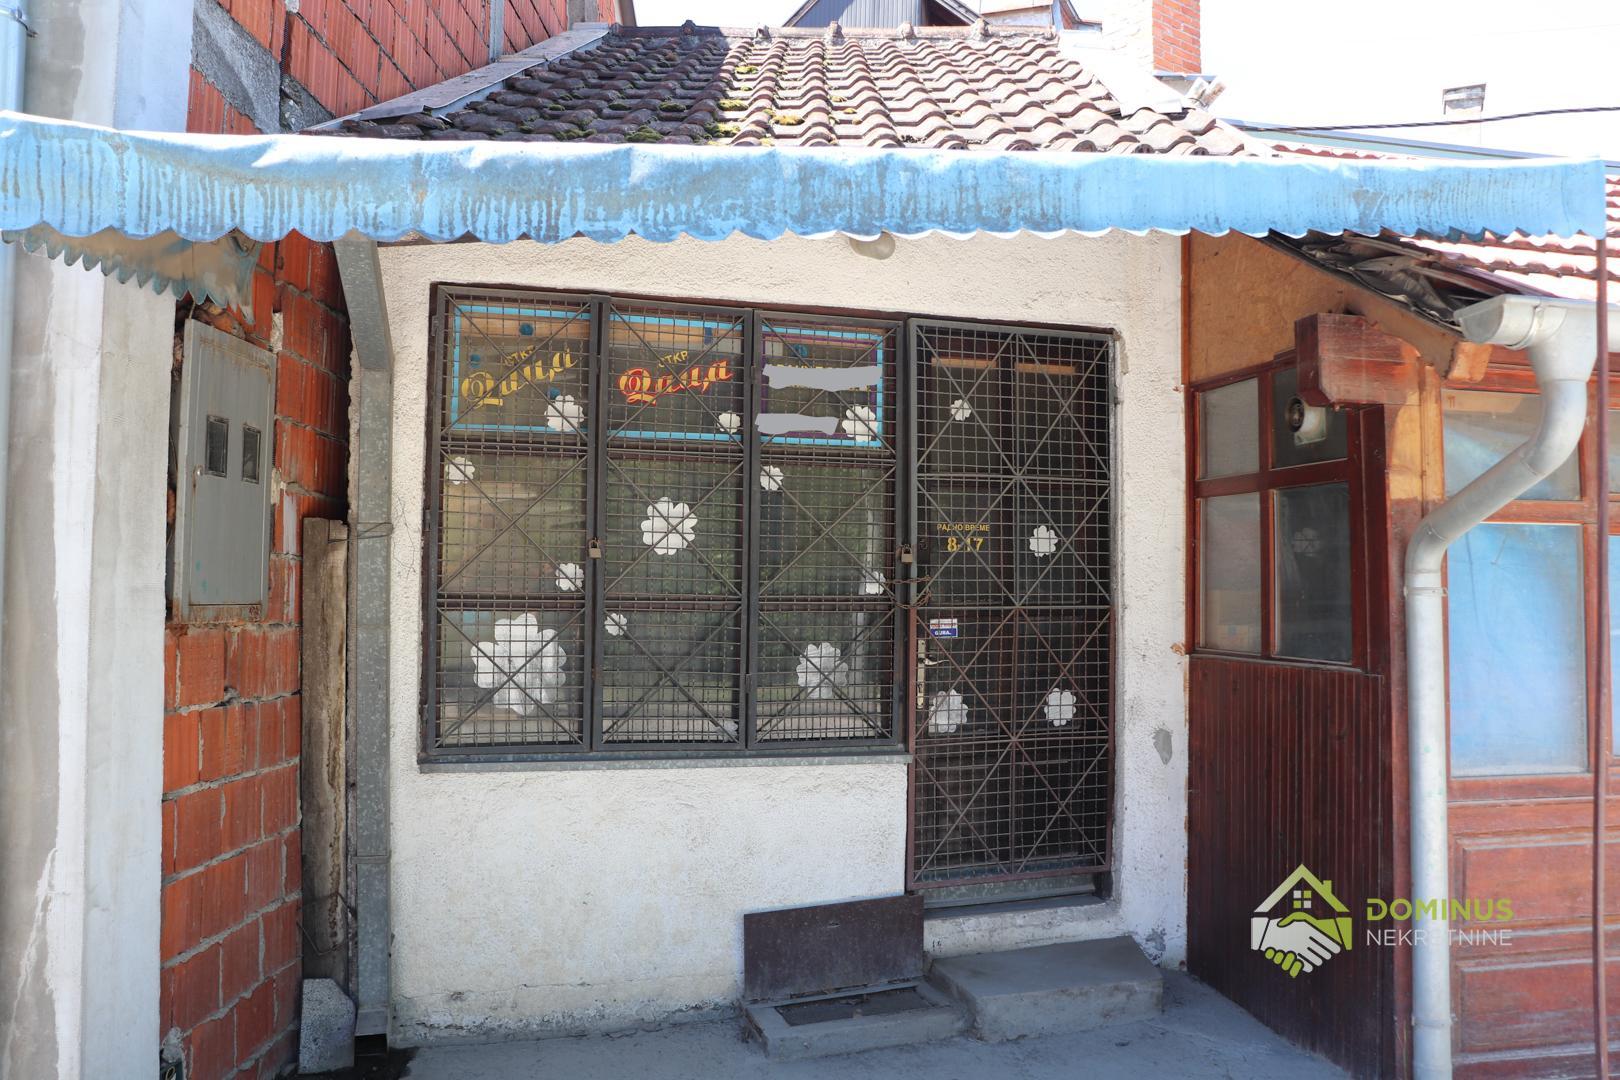 Poslovni prostor 17m2, Ješovac Aranđelovac